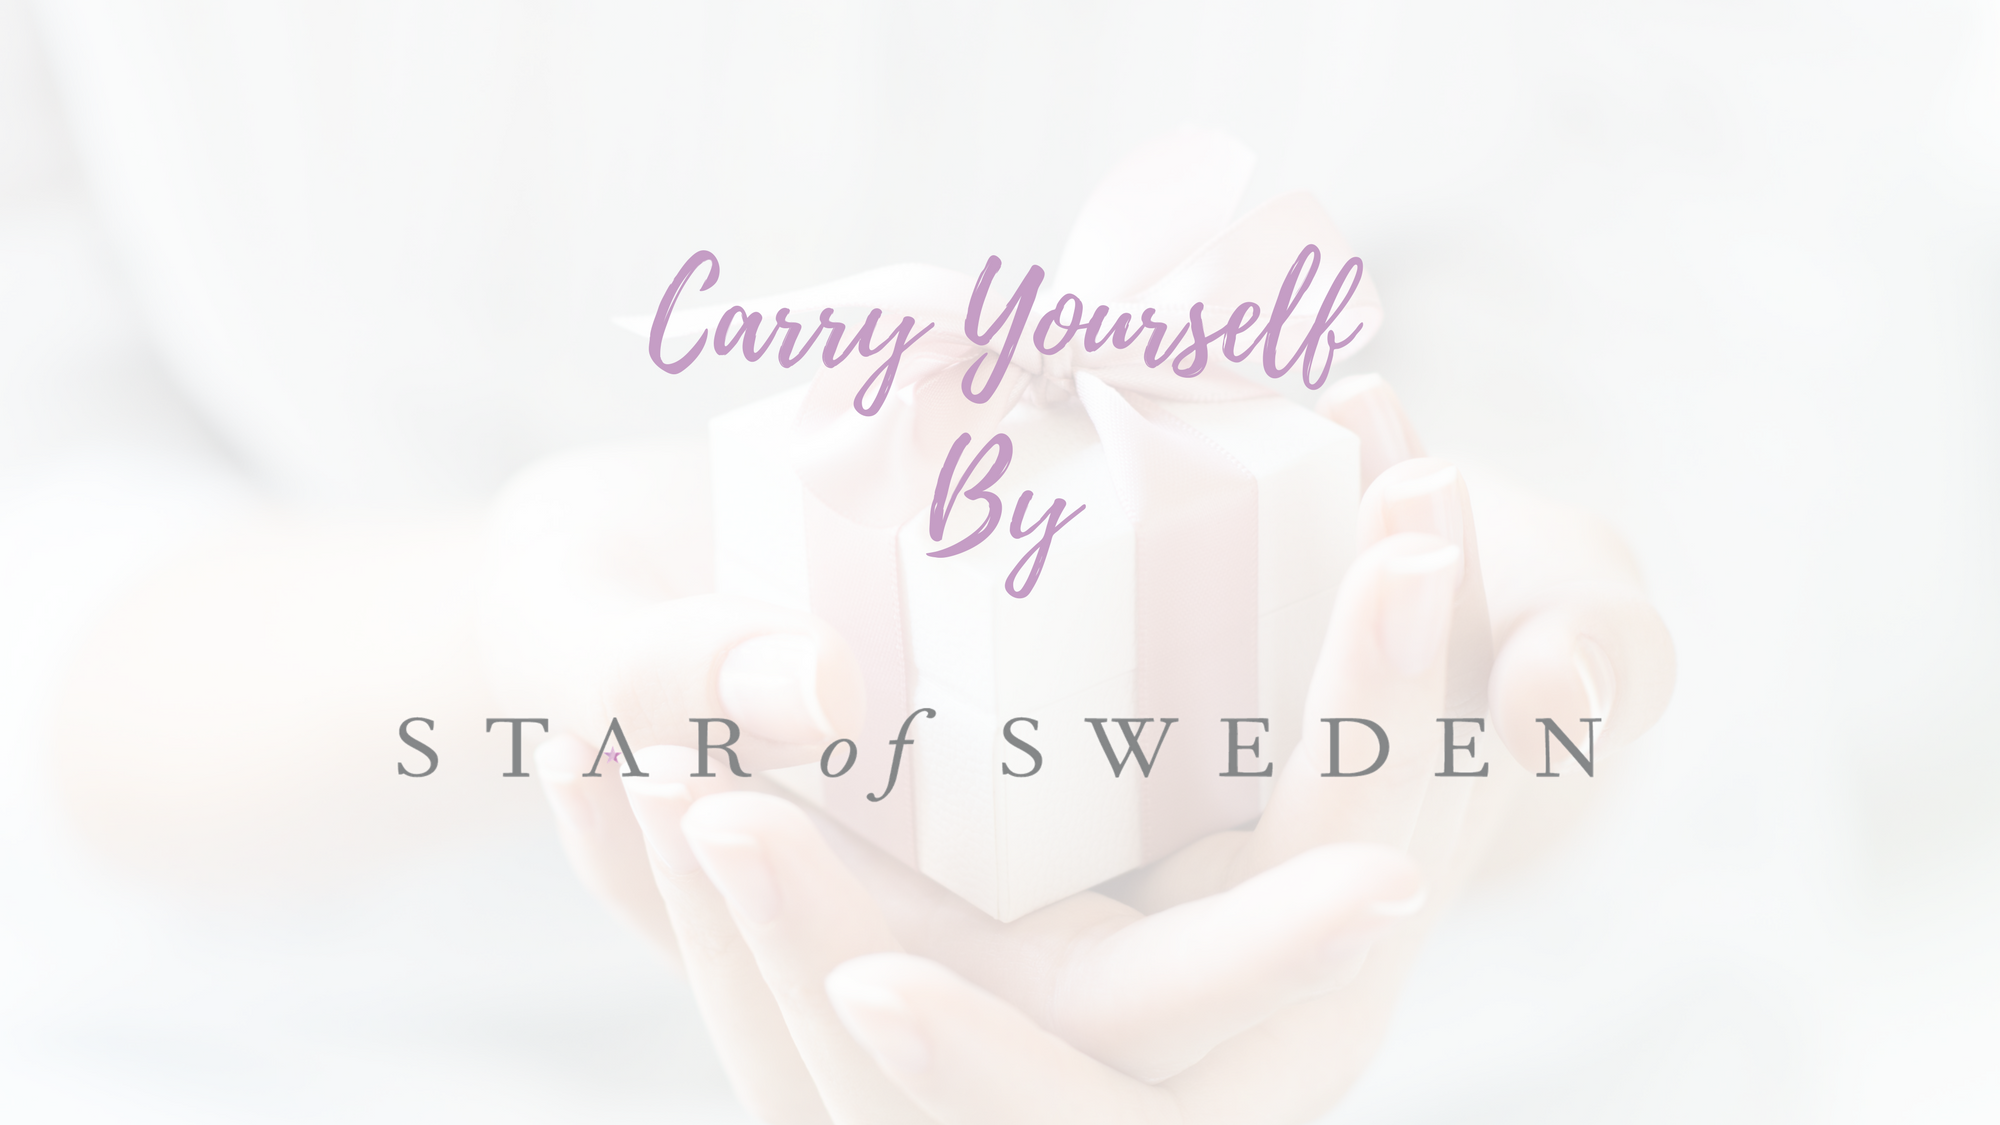 starofsweden-carryyourself-2